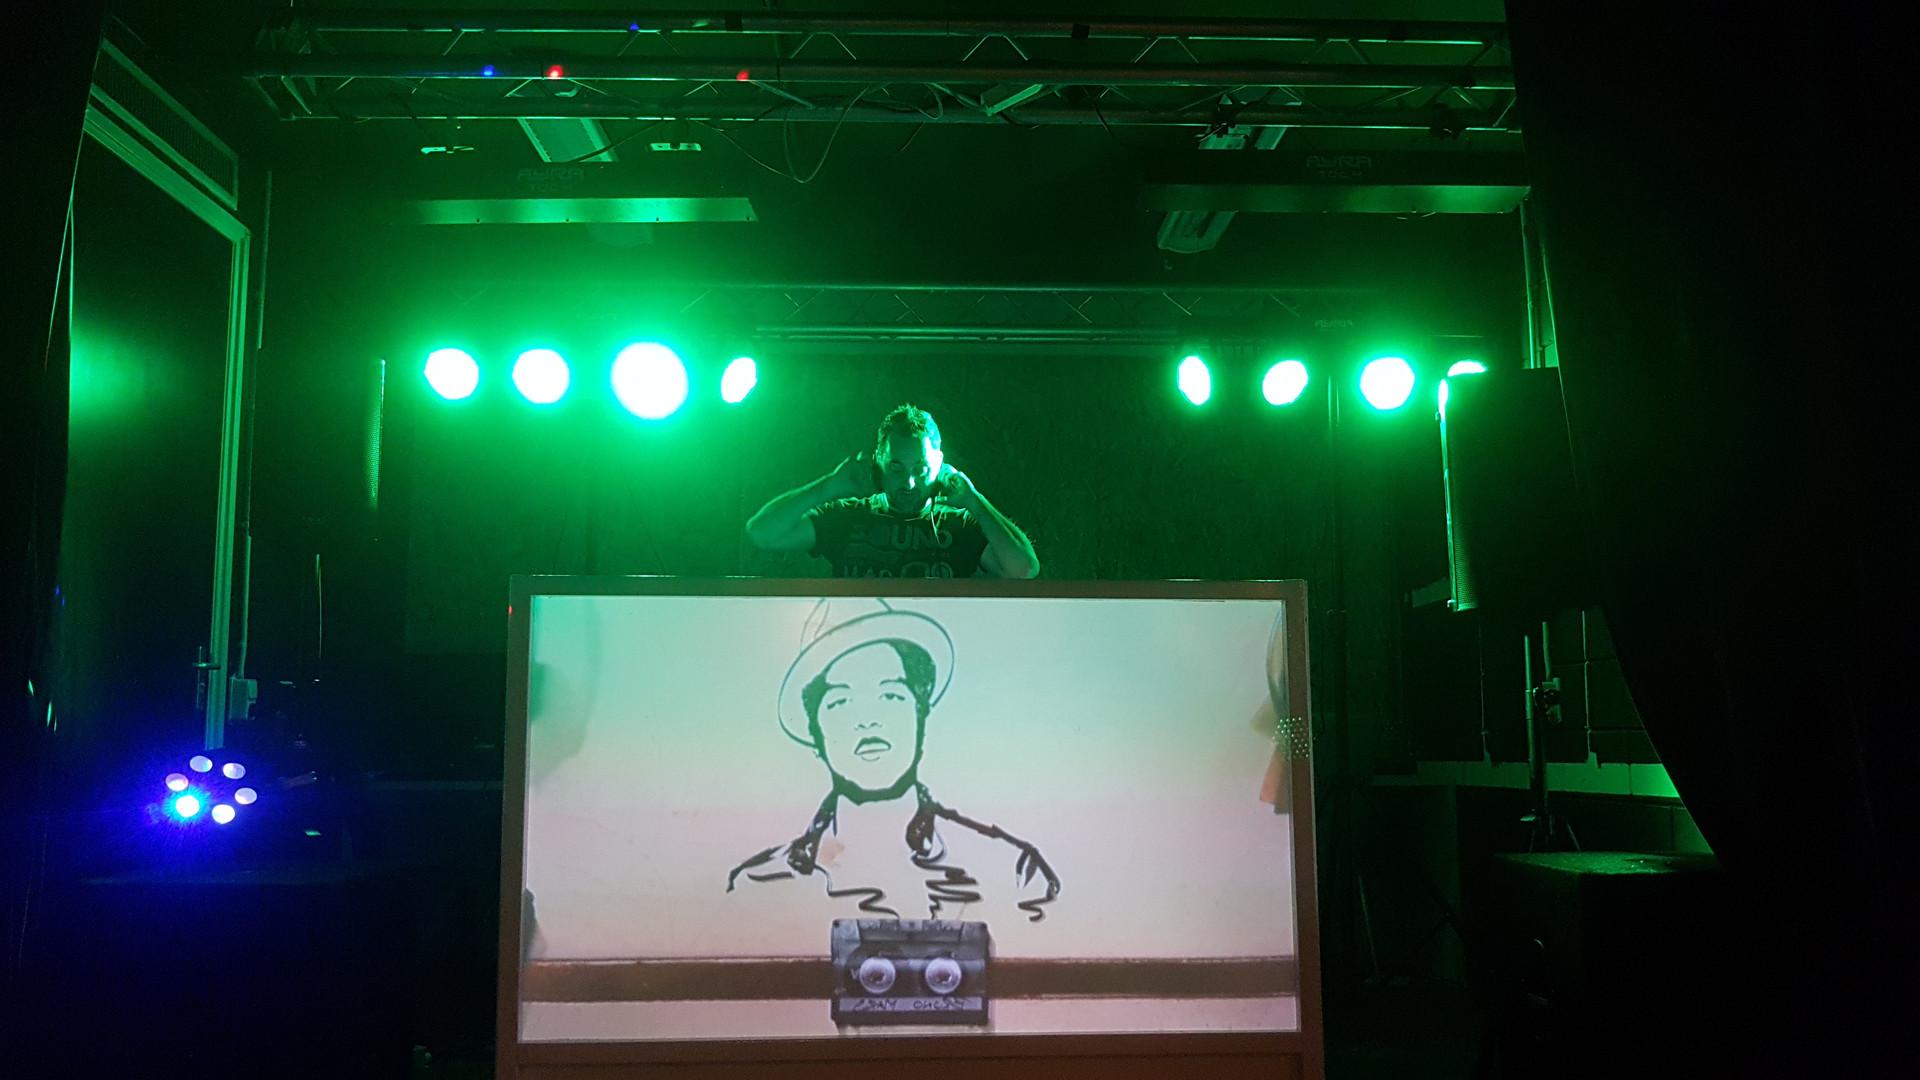 Video DJ Booth